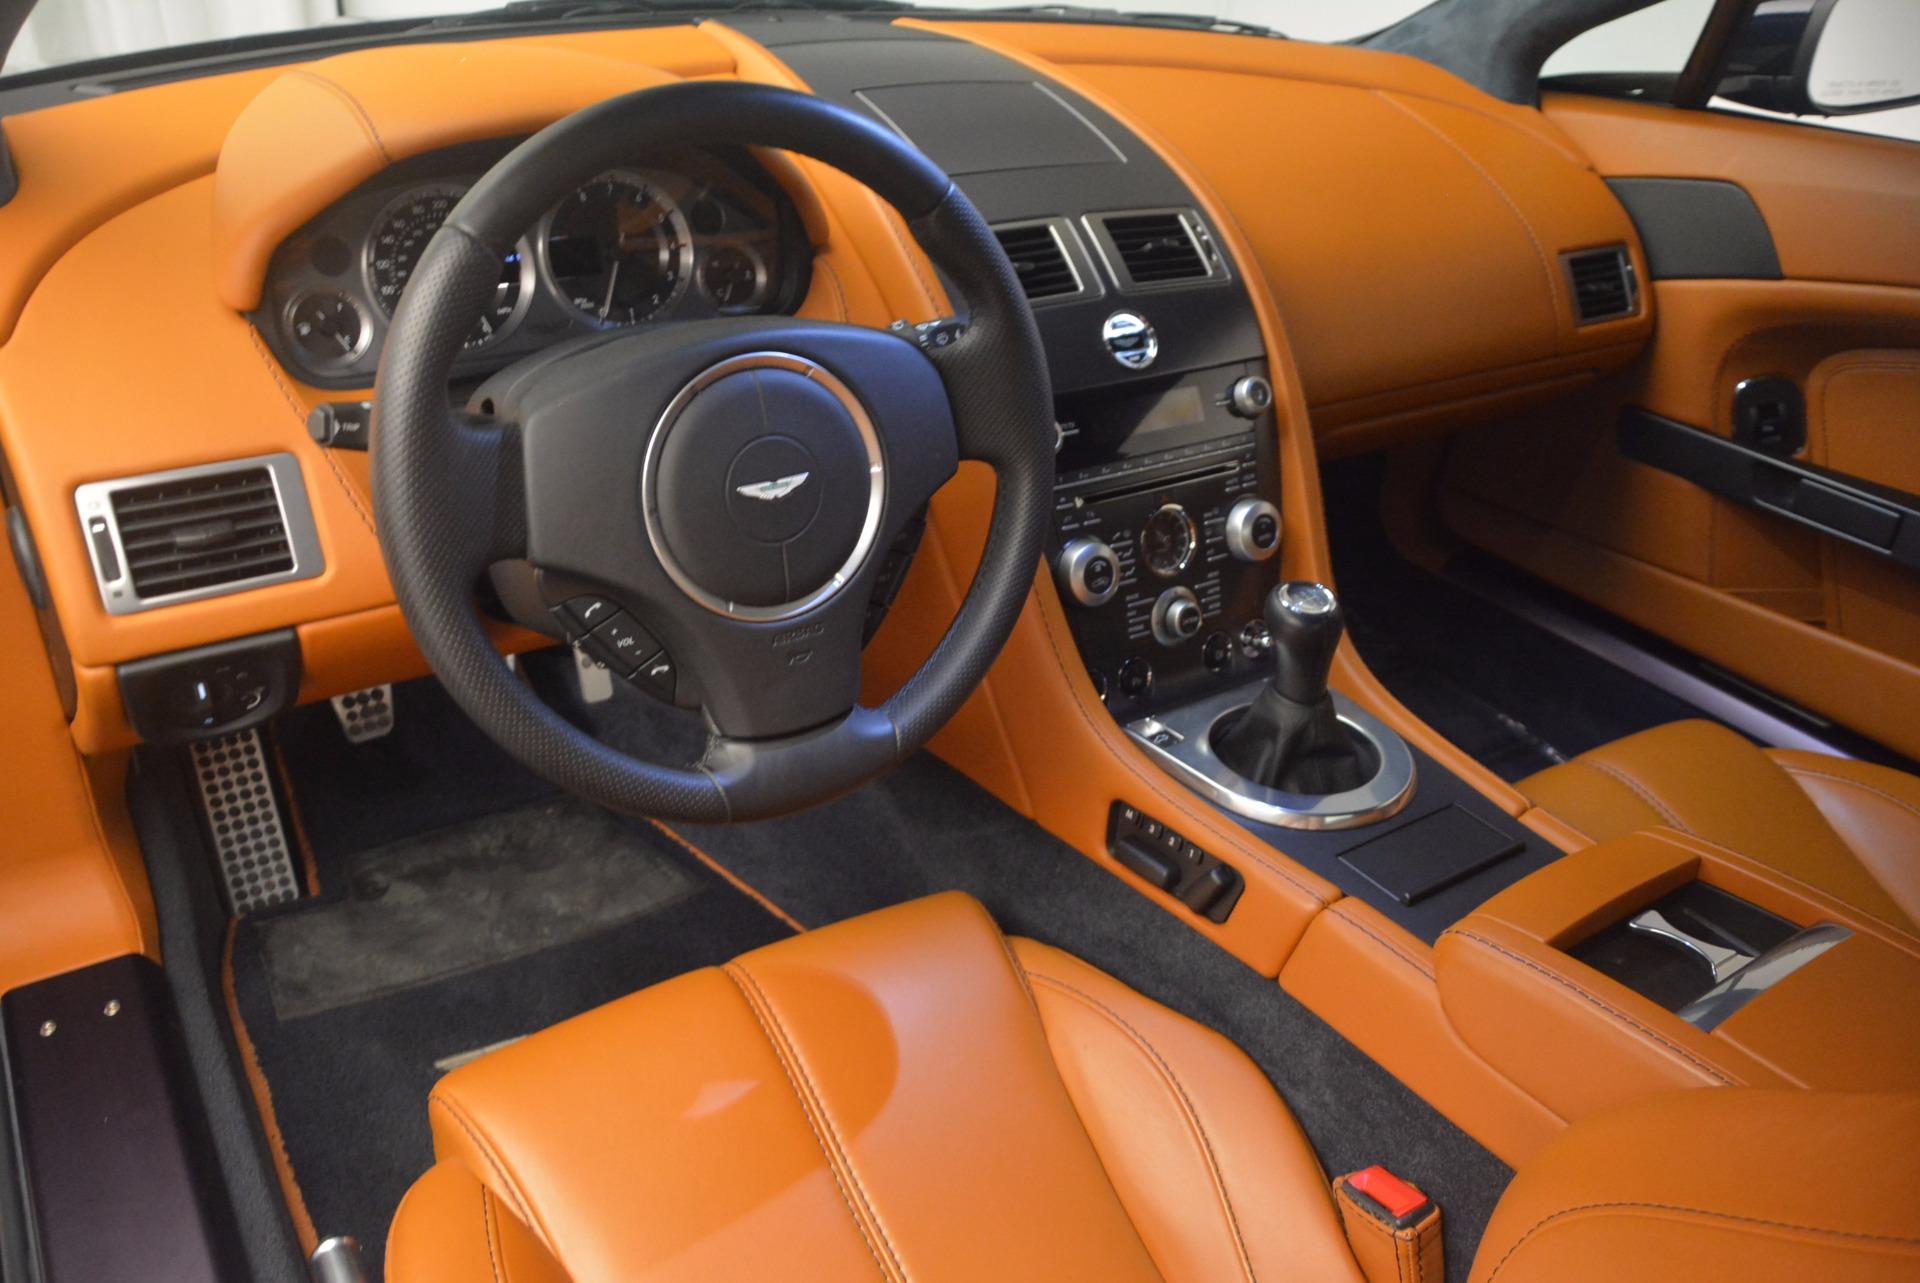 Used 2009 Aston Martin V8 Vantage  For Sale In Greenwich, CT 1183_p15